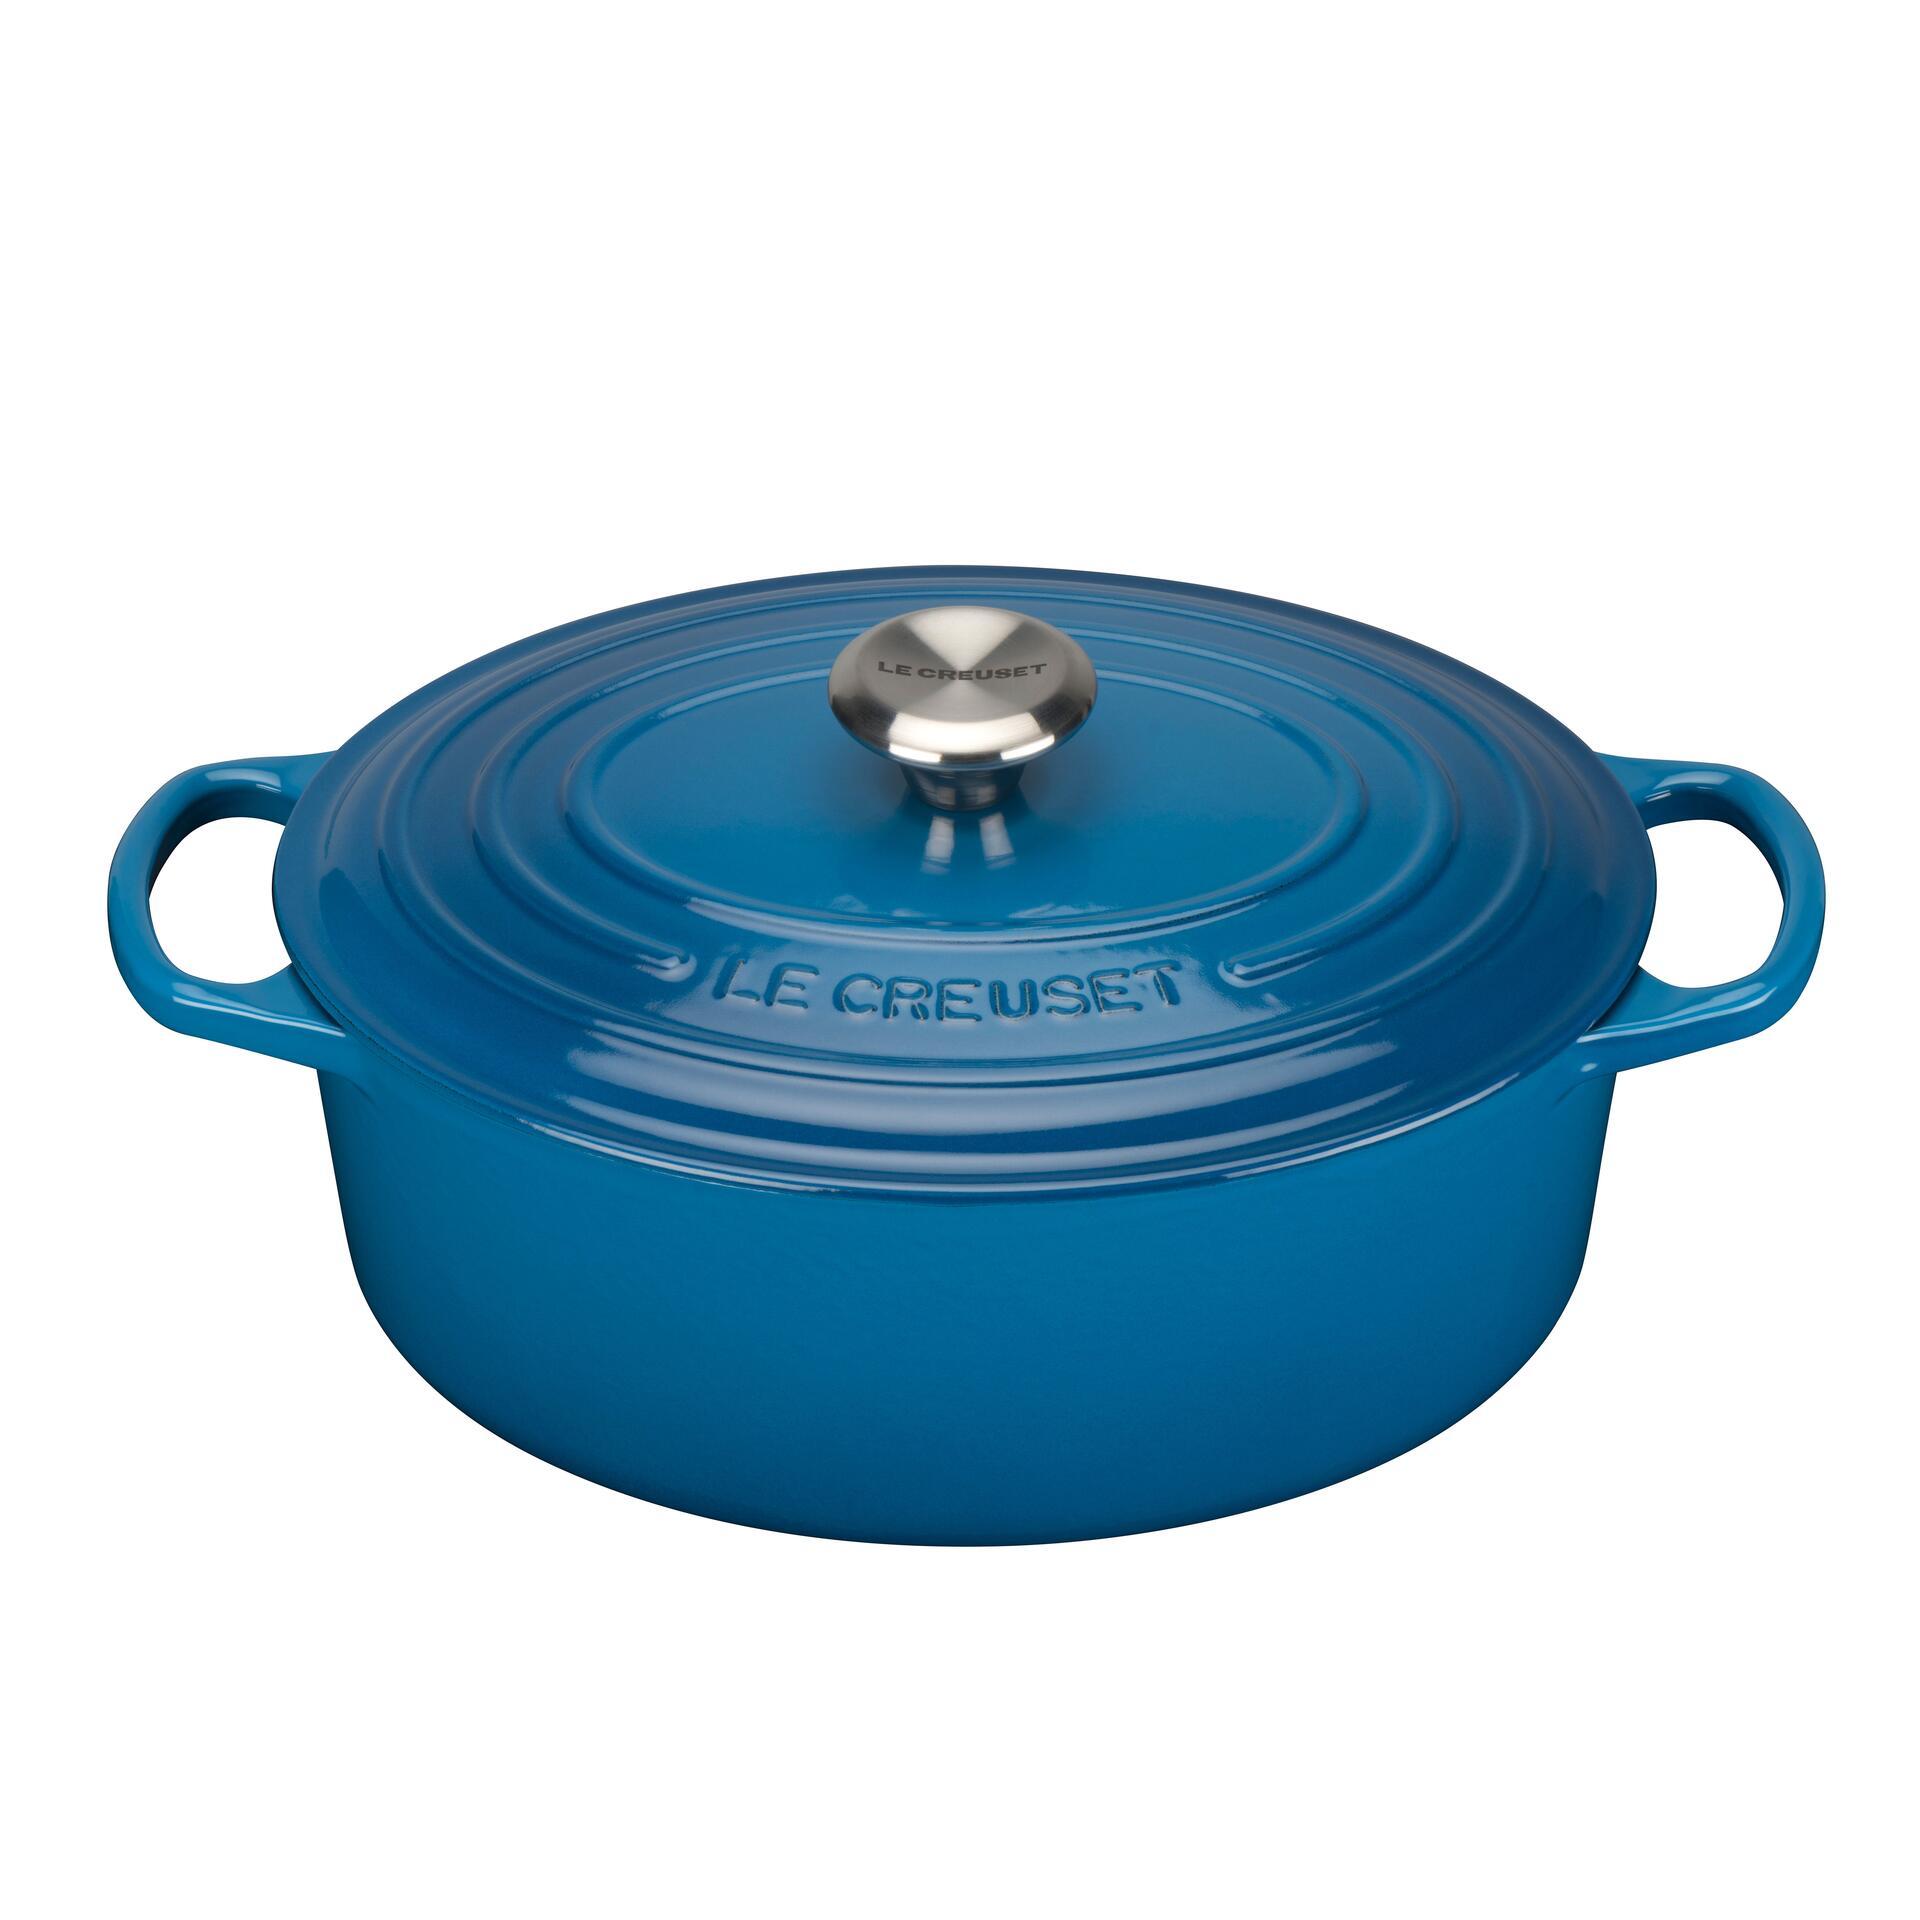 Le Creuset Bräter Signature 31 cm oval Marseille Blau 6,3 L